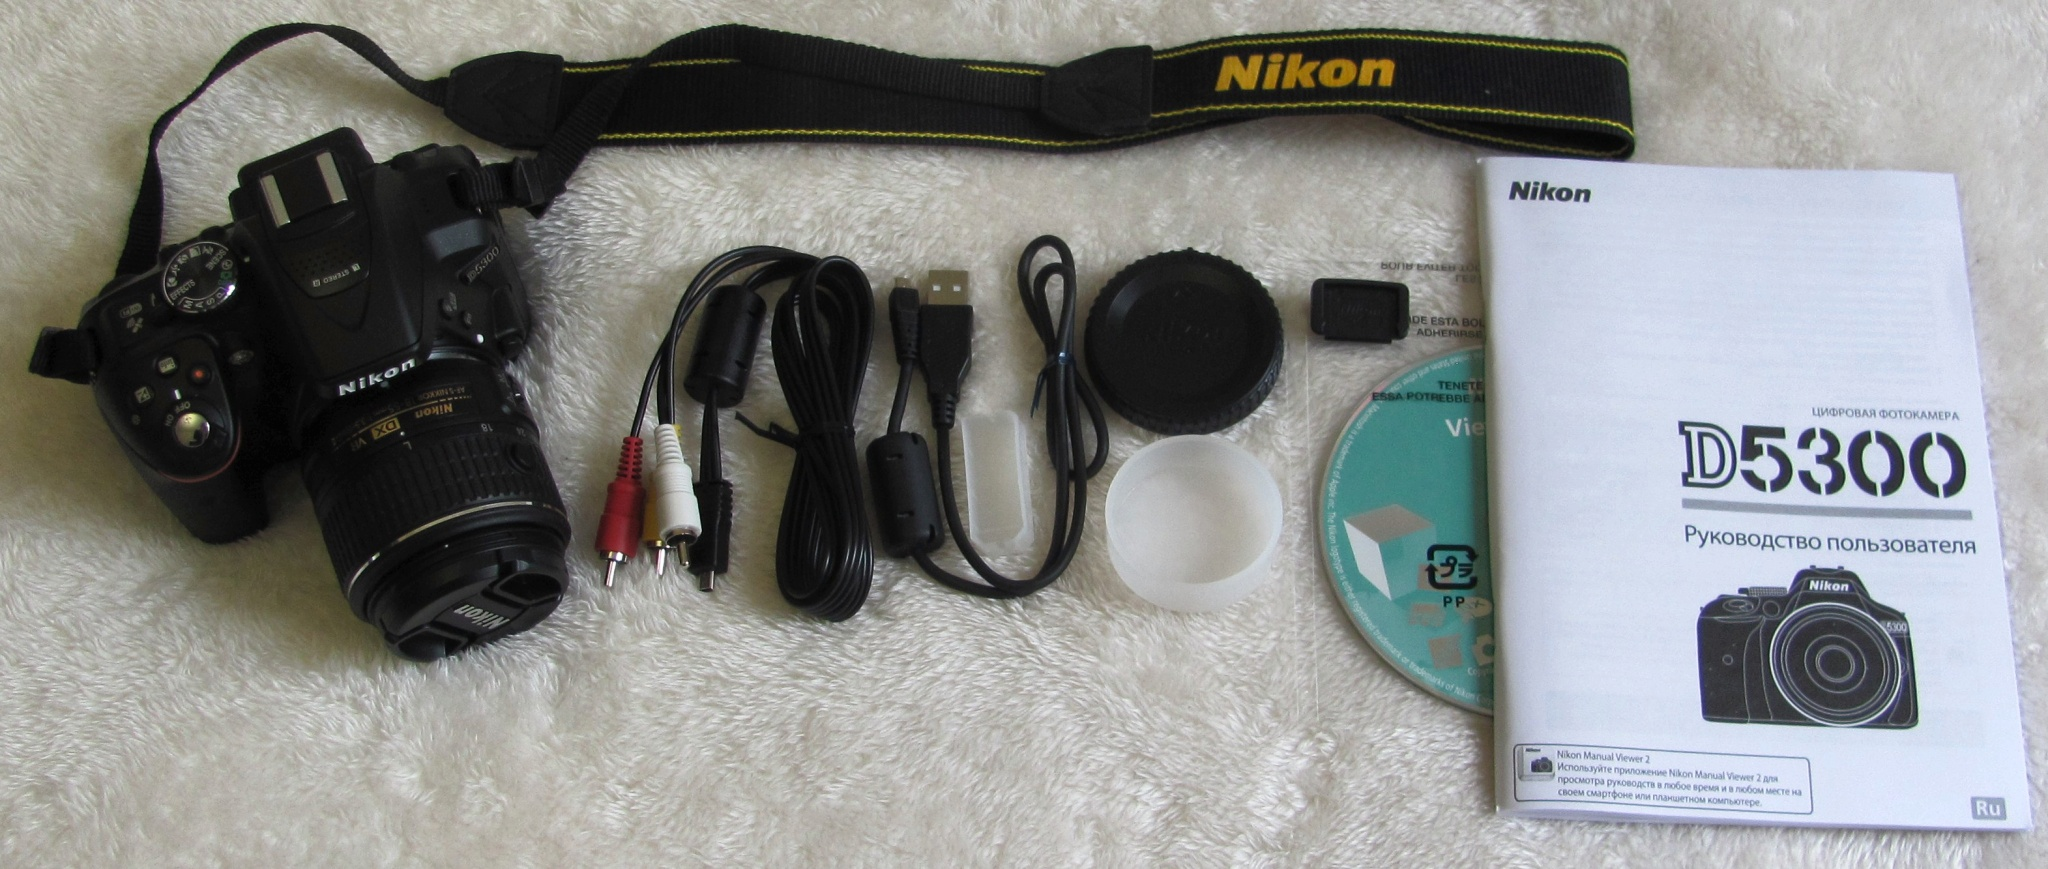 Borsa per fotocamera nikon 94